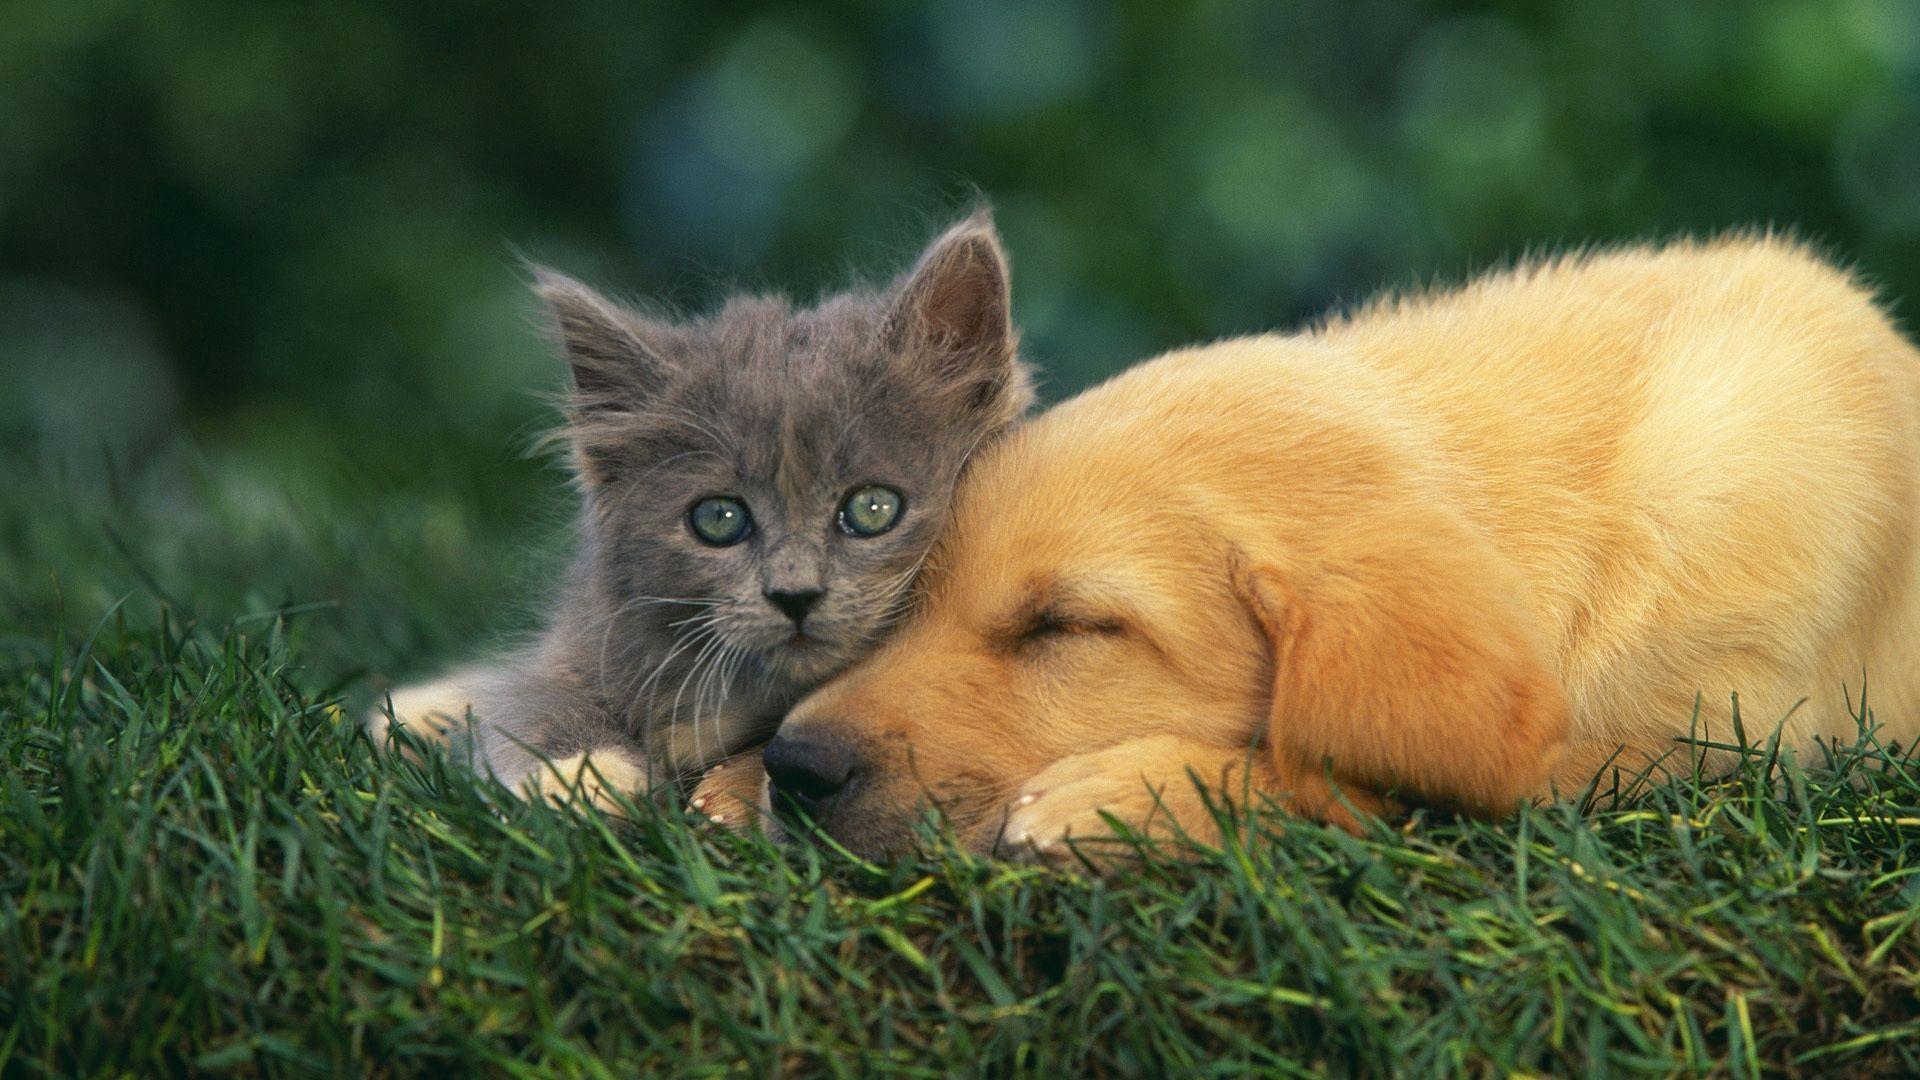 Puppy And Kitten PC Wallpaper